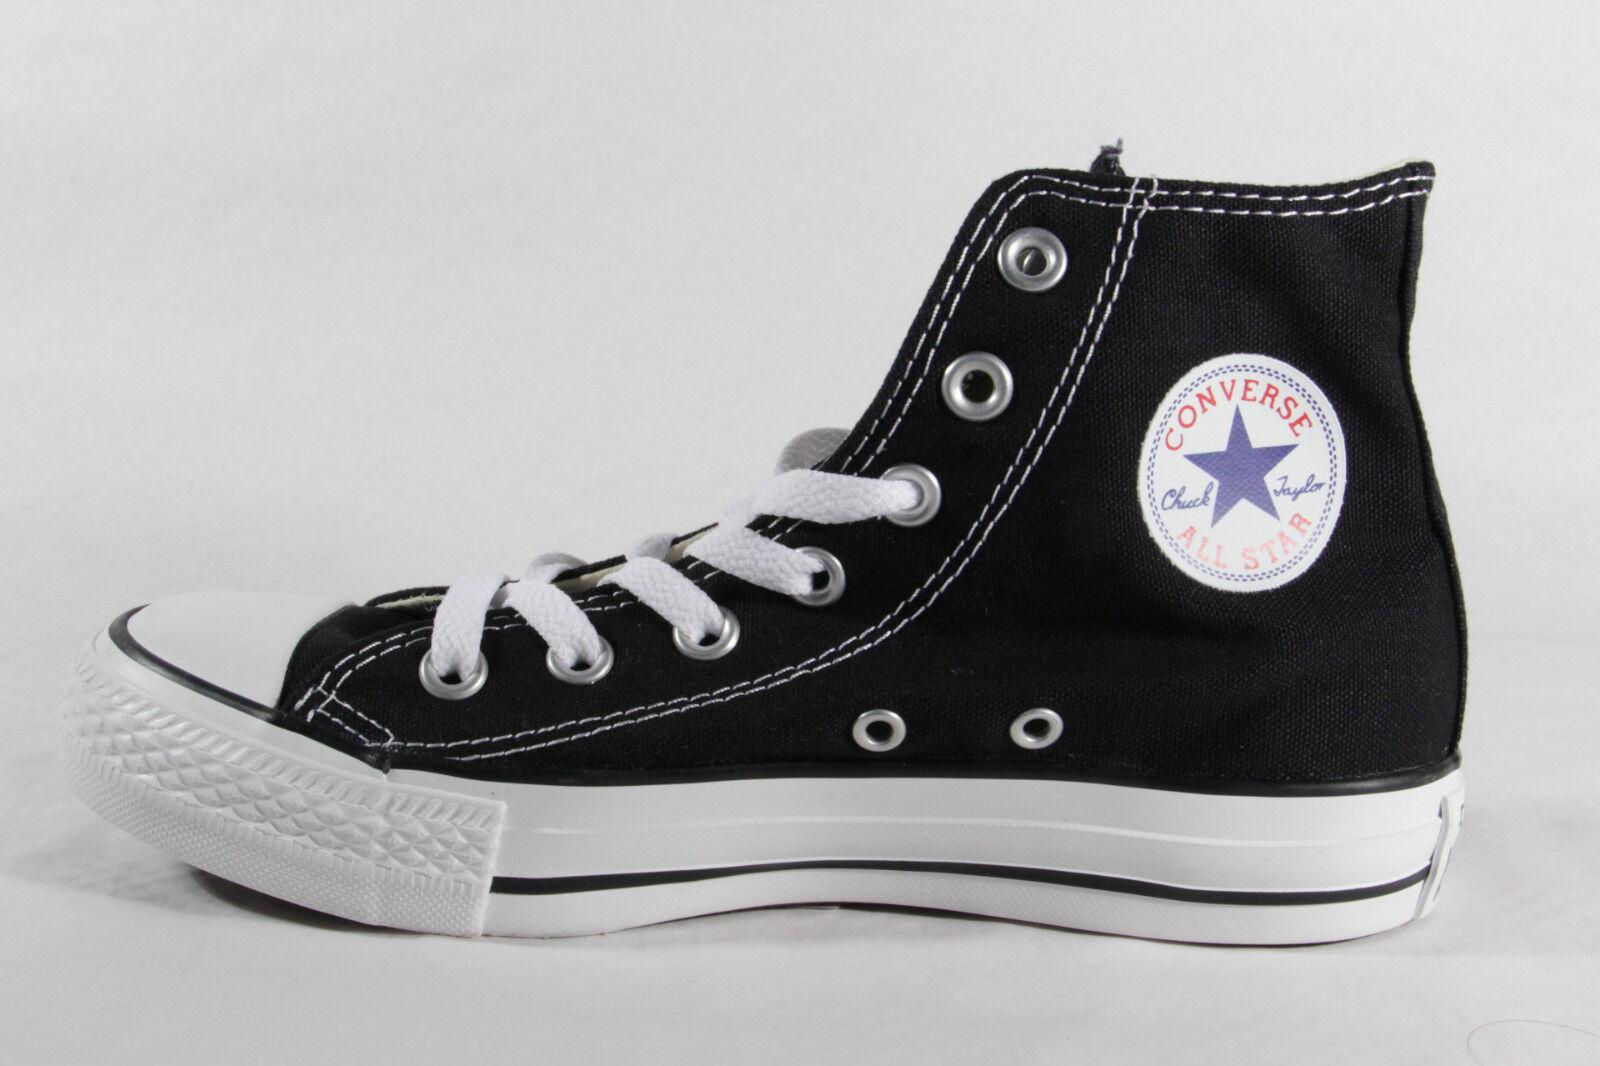 Converse All Star Star Star botas , negro, TEXTIL / lino, m9160c NUEVO 6b3c62